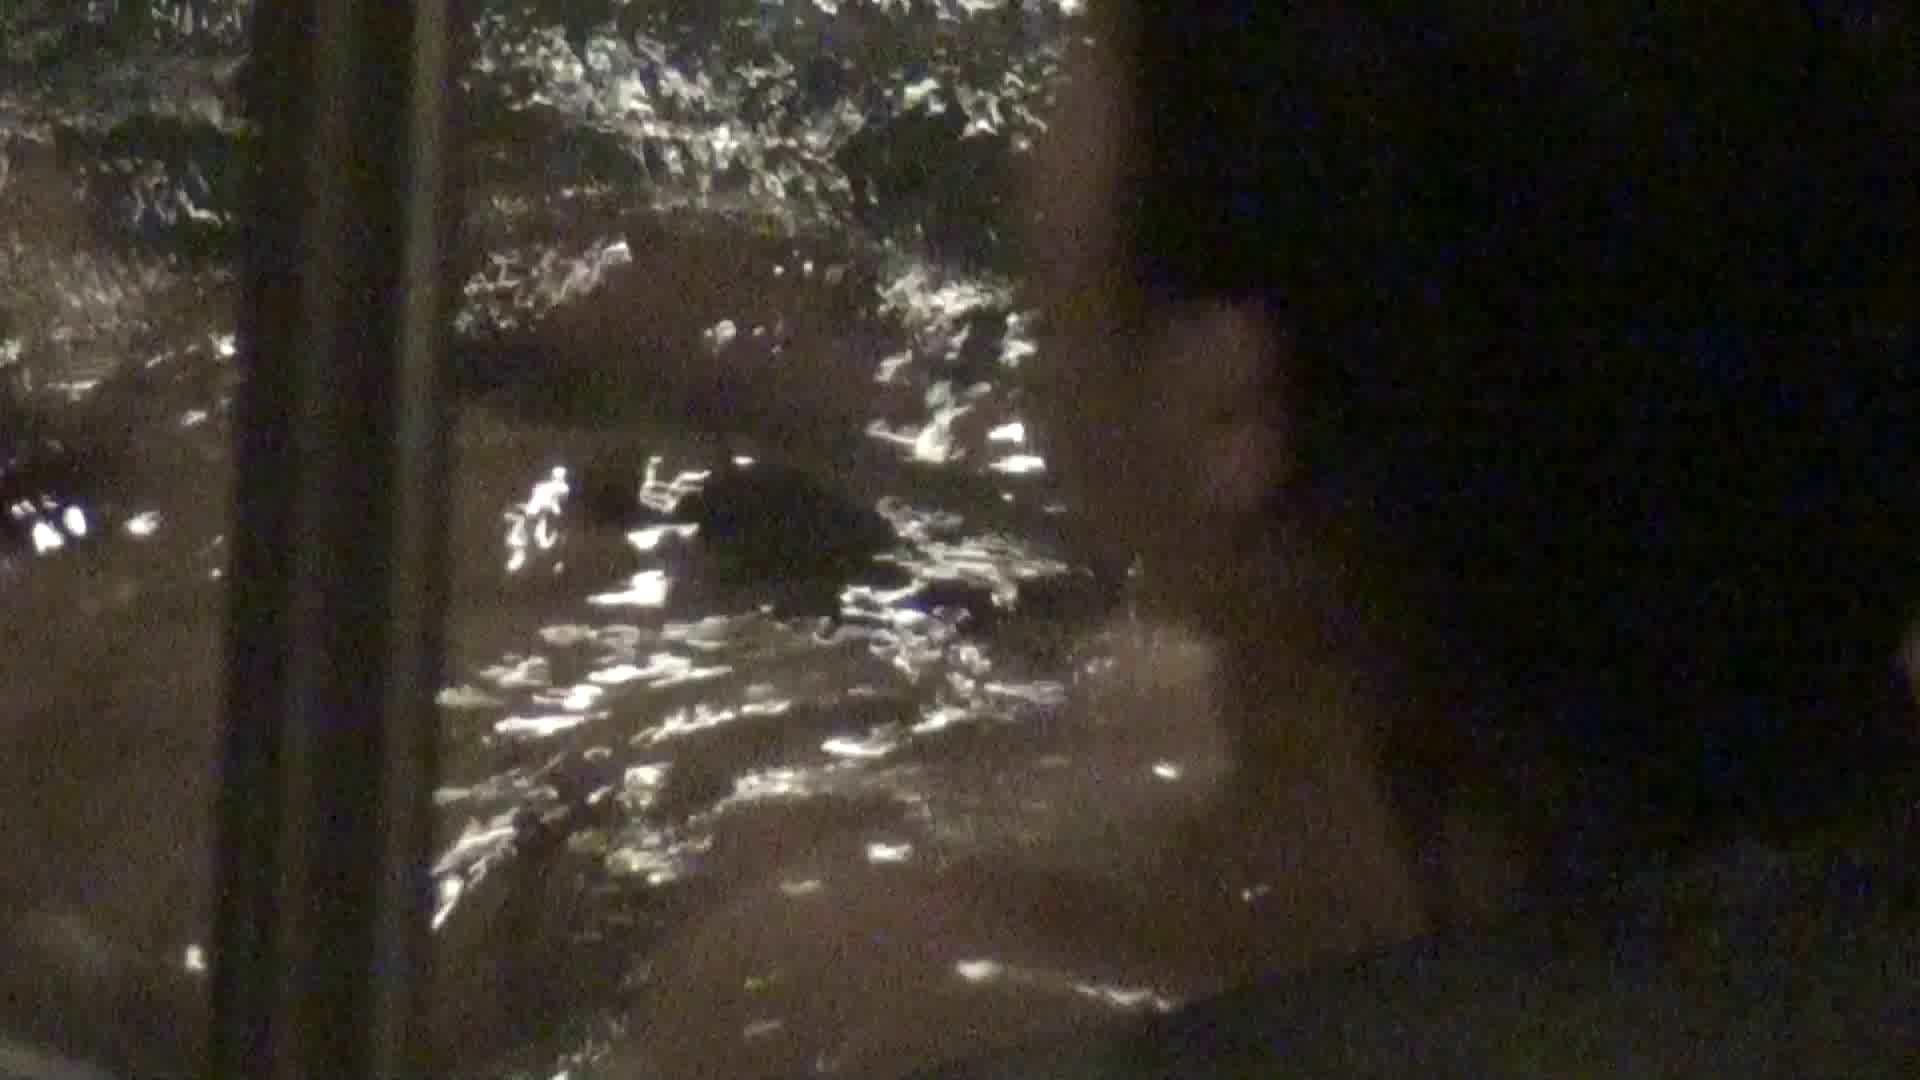 Aquaな露天風呂Vol.403 露天風呂 | OLのエロ生活  84連発 34